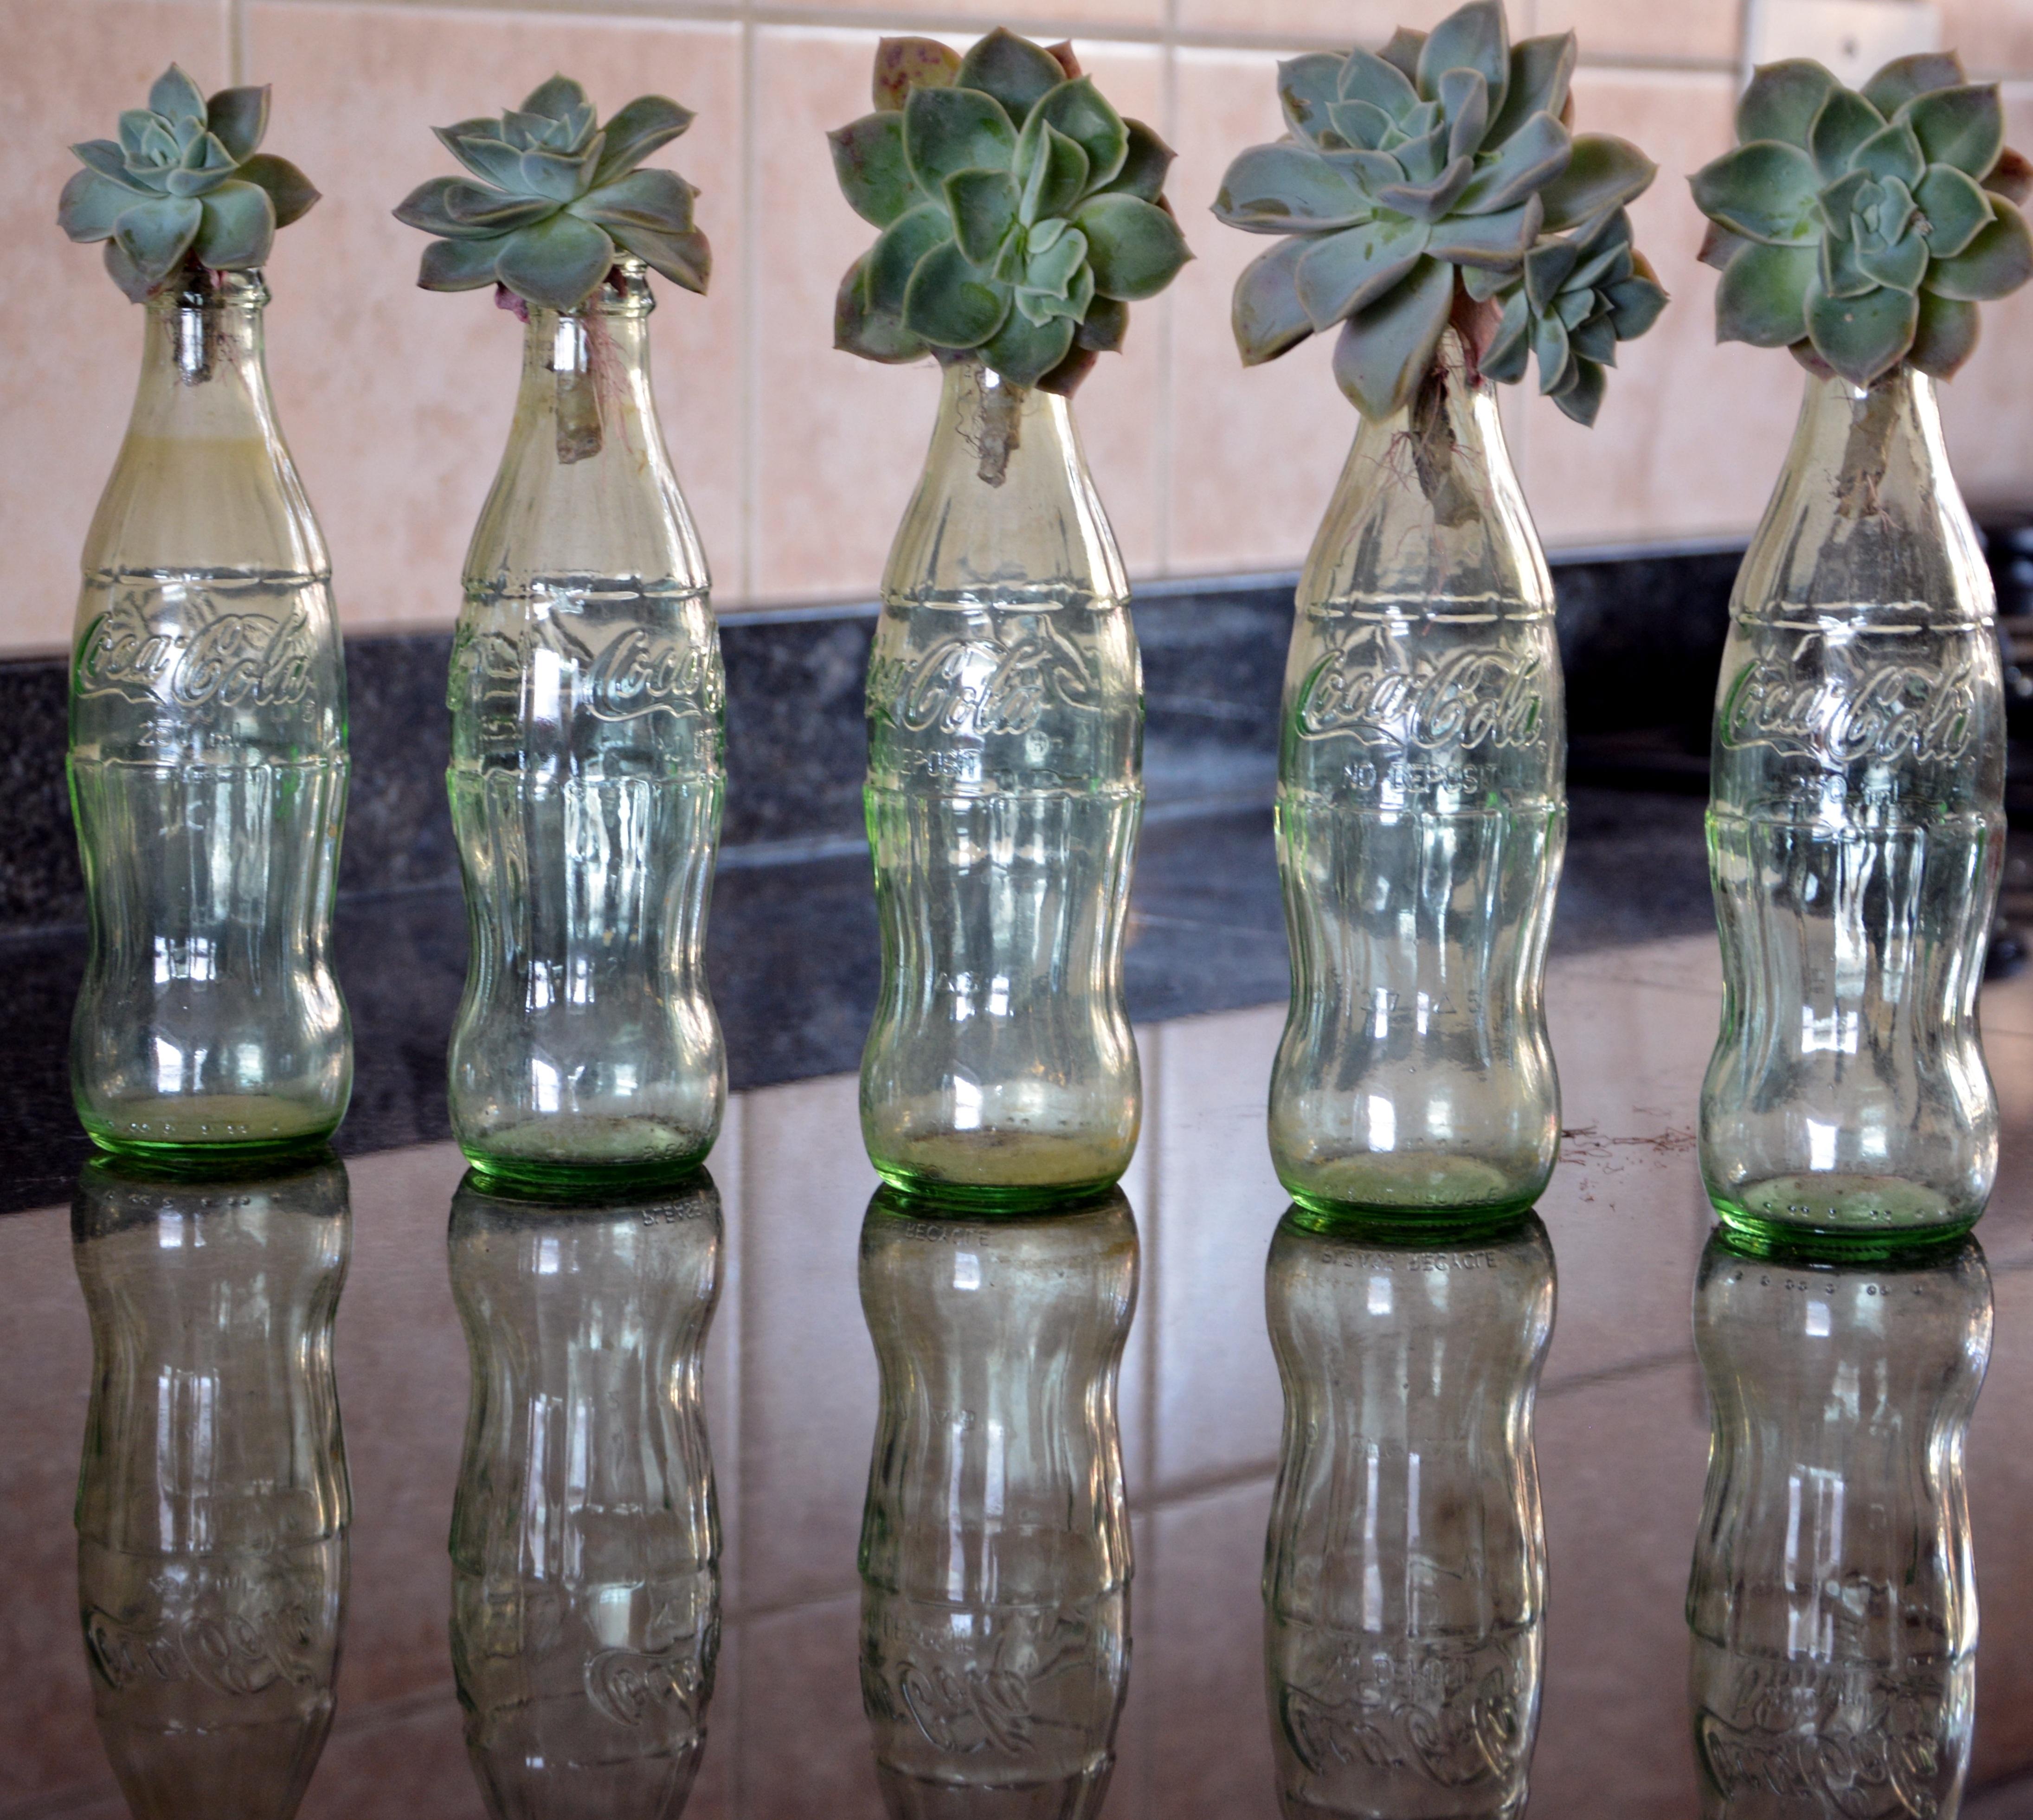 Fotos gratis vaso florero decoracin reflexin iluminacin